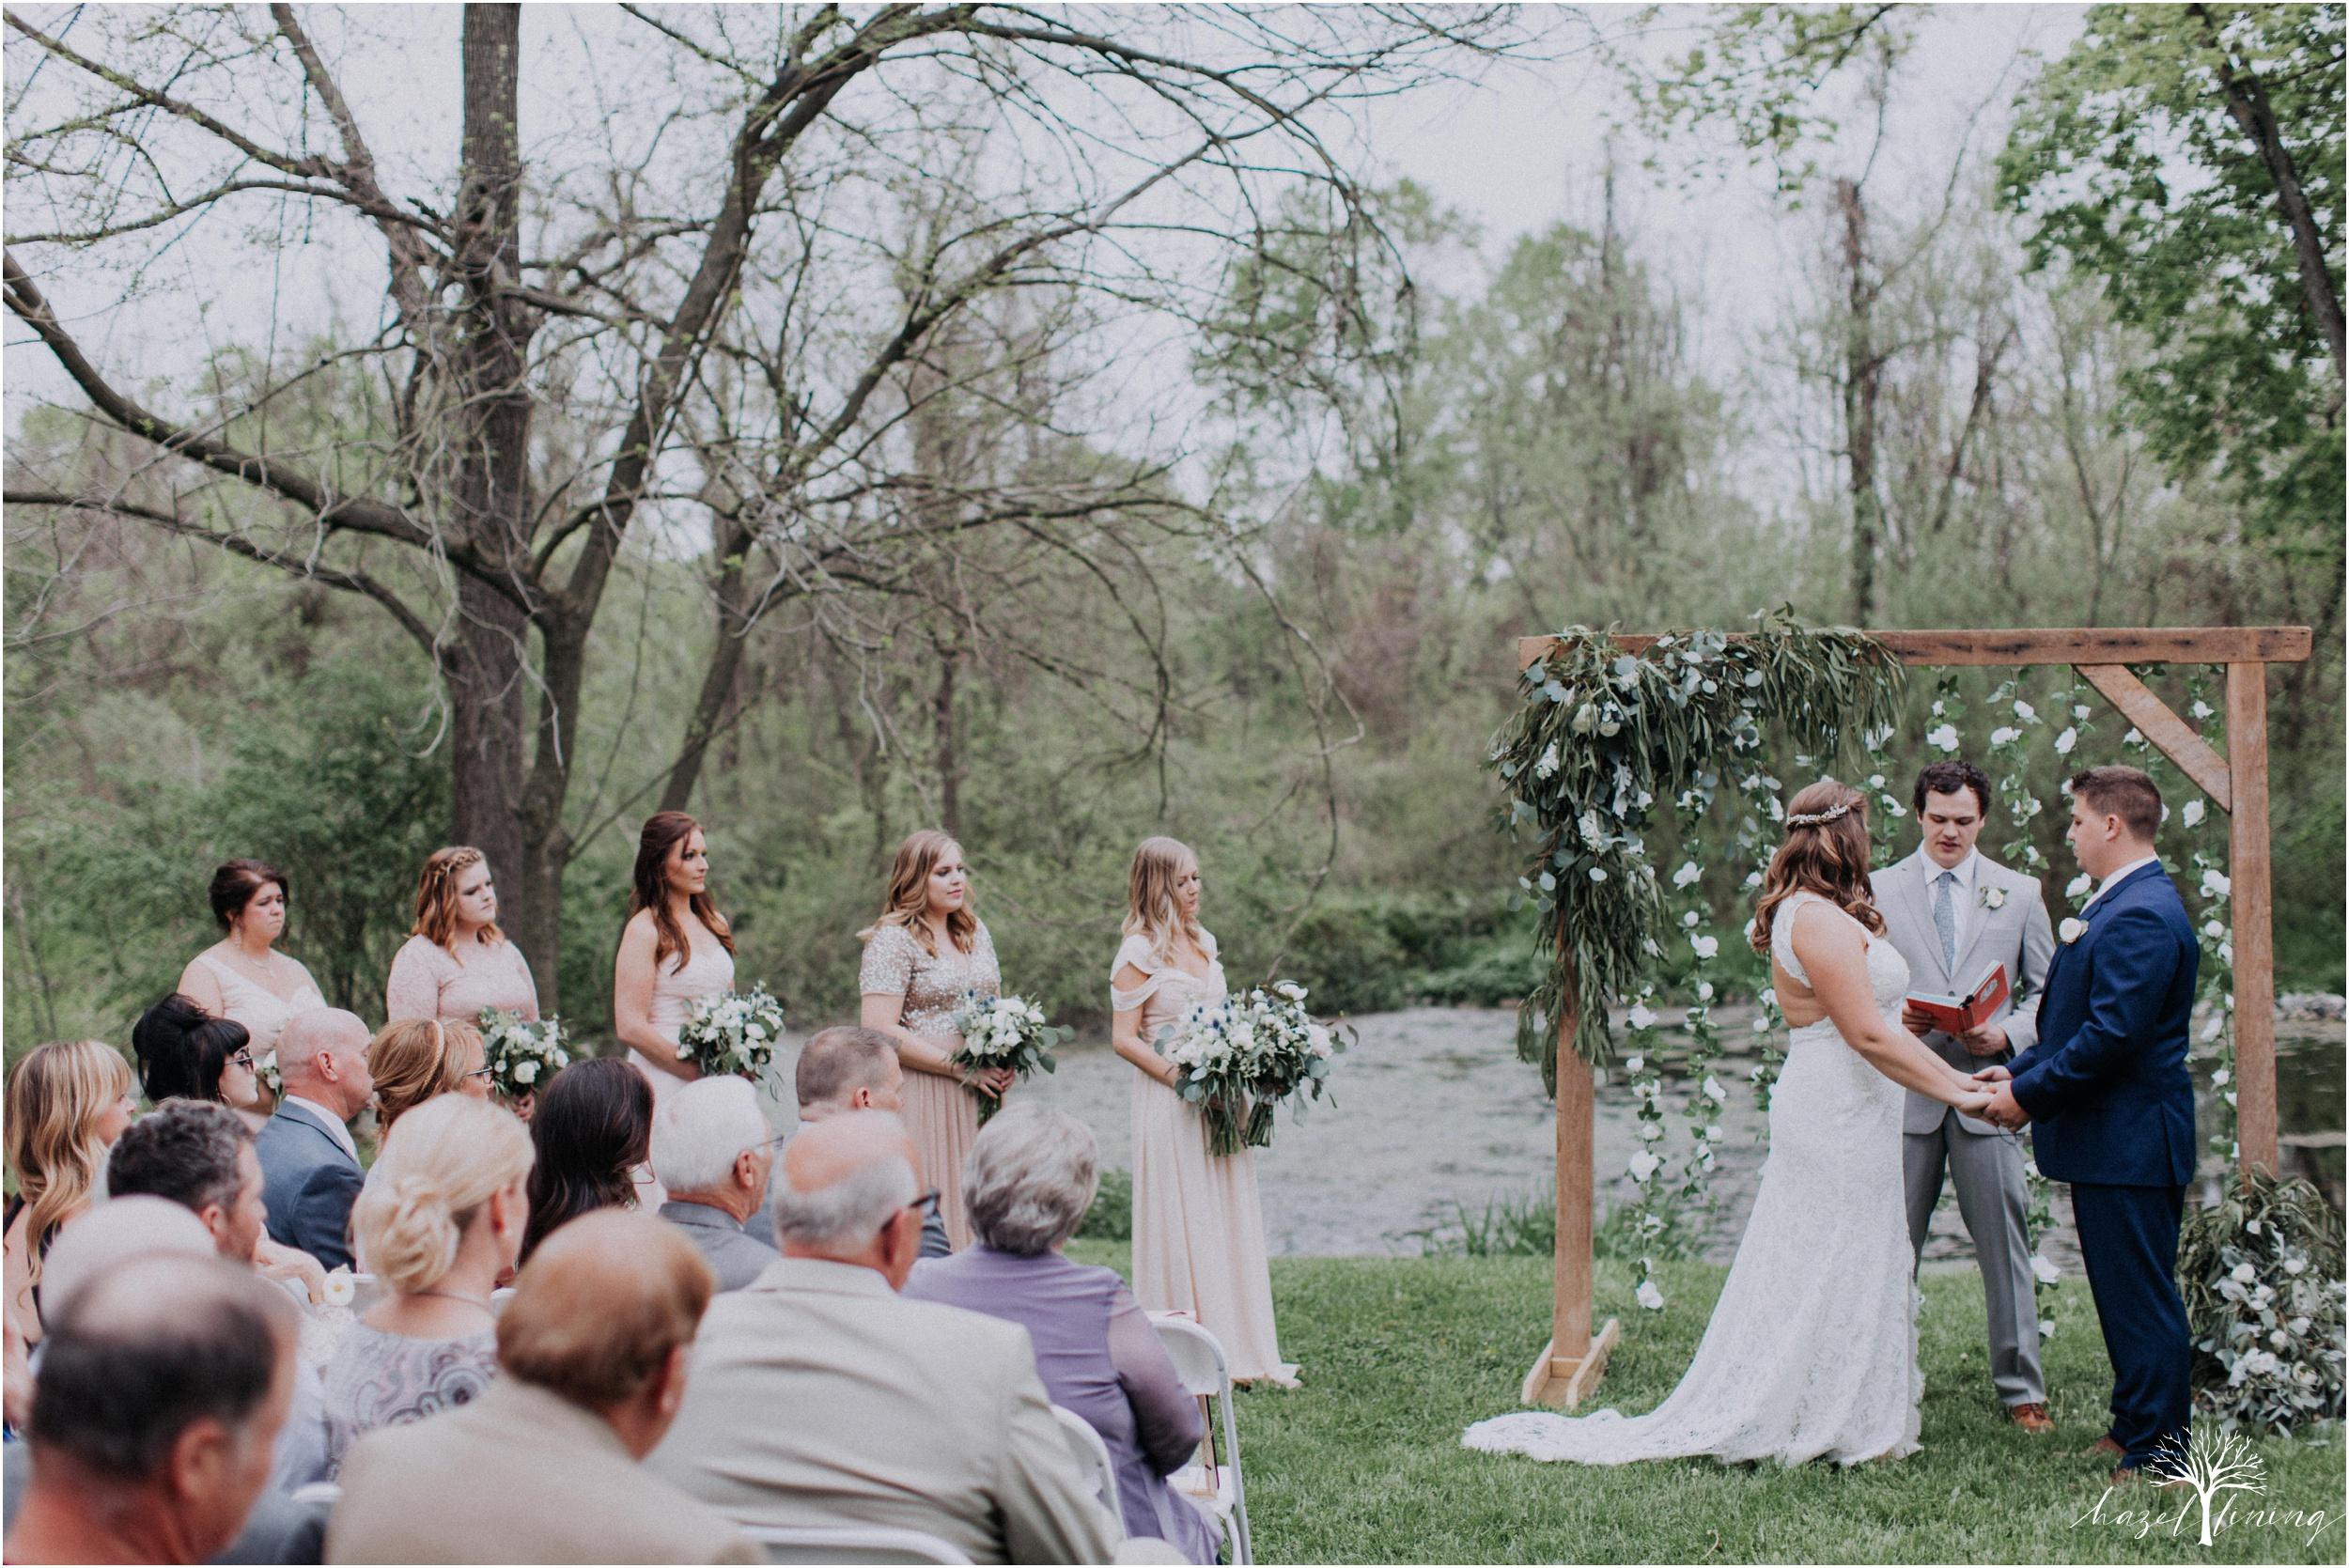 hazel-lining-travel-wedding-elopement-photography-abby-skyler-hunt-the-willis-house-york-pennsylvania-outdoor-estate-wedding_0083.jpg